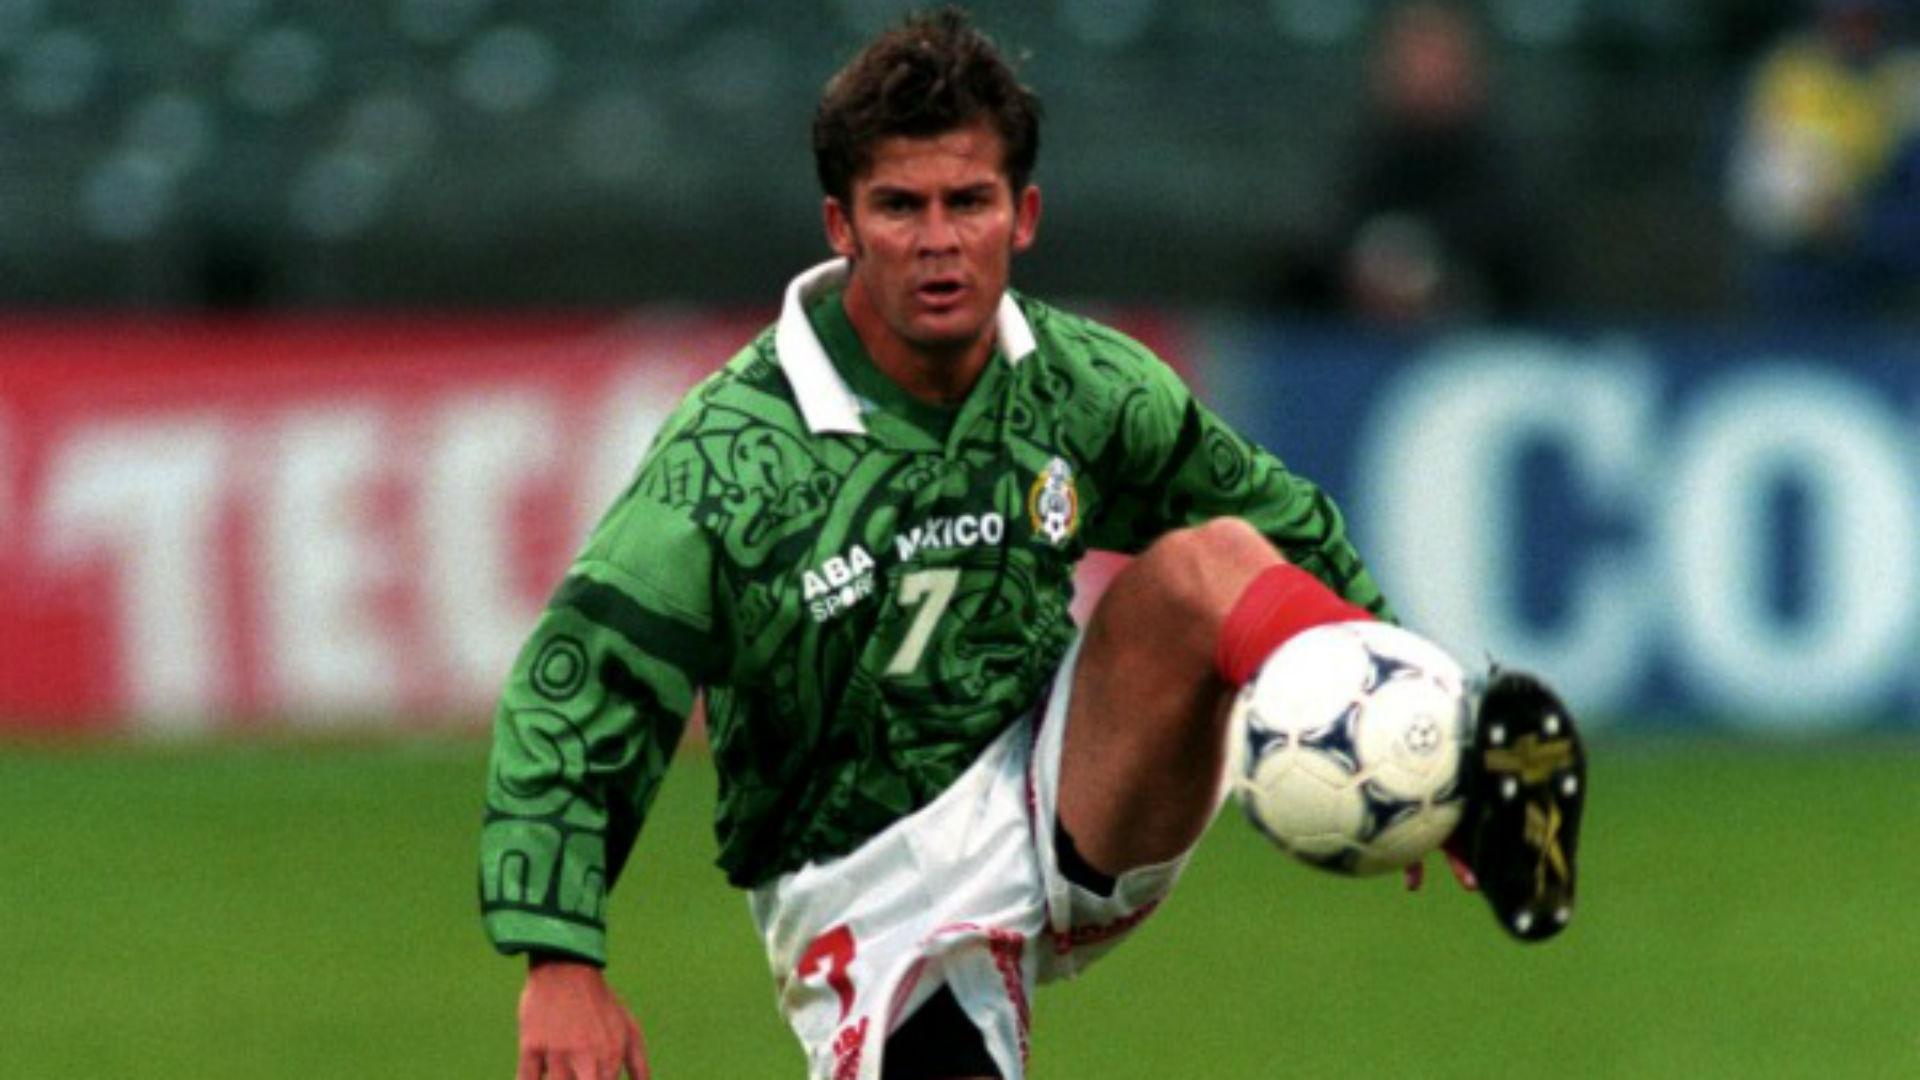 Ramón Ramírez, el zurdo de oro mexicano | Goal.com